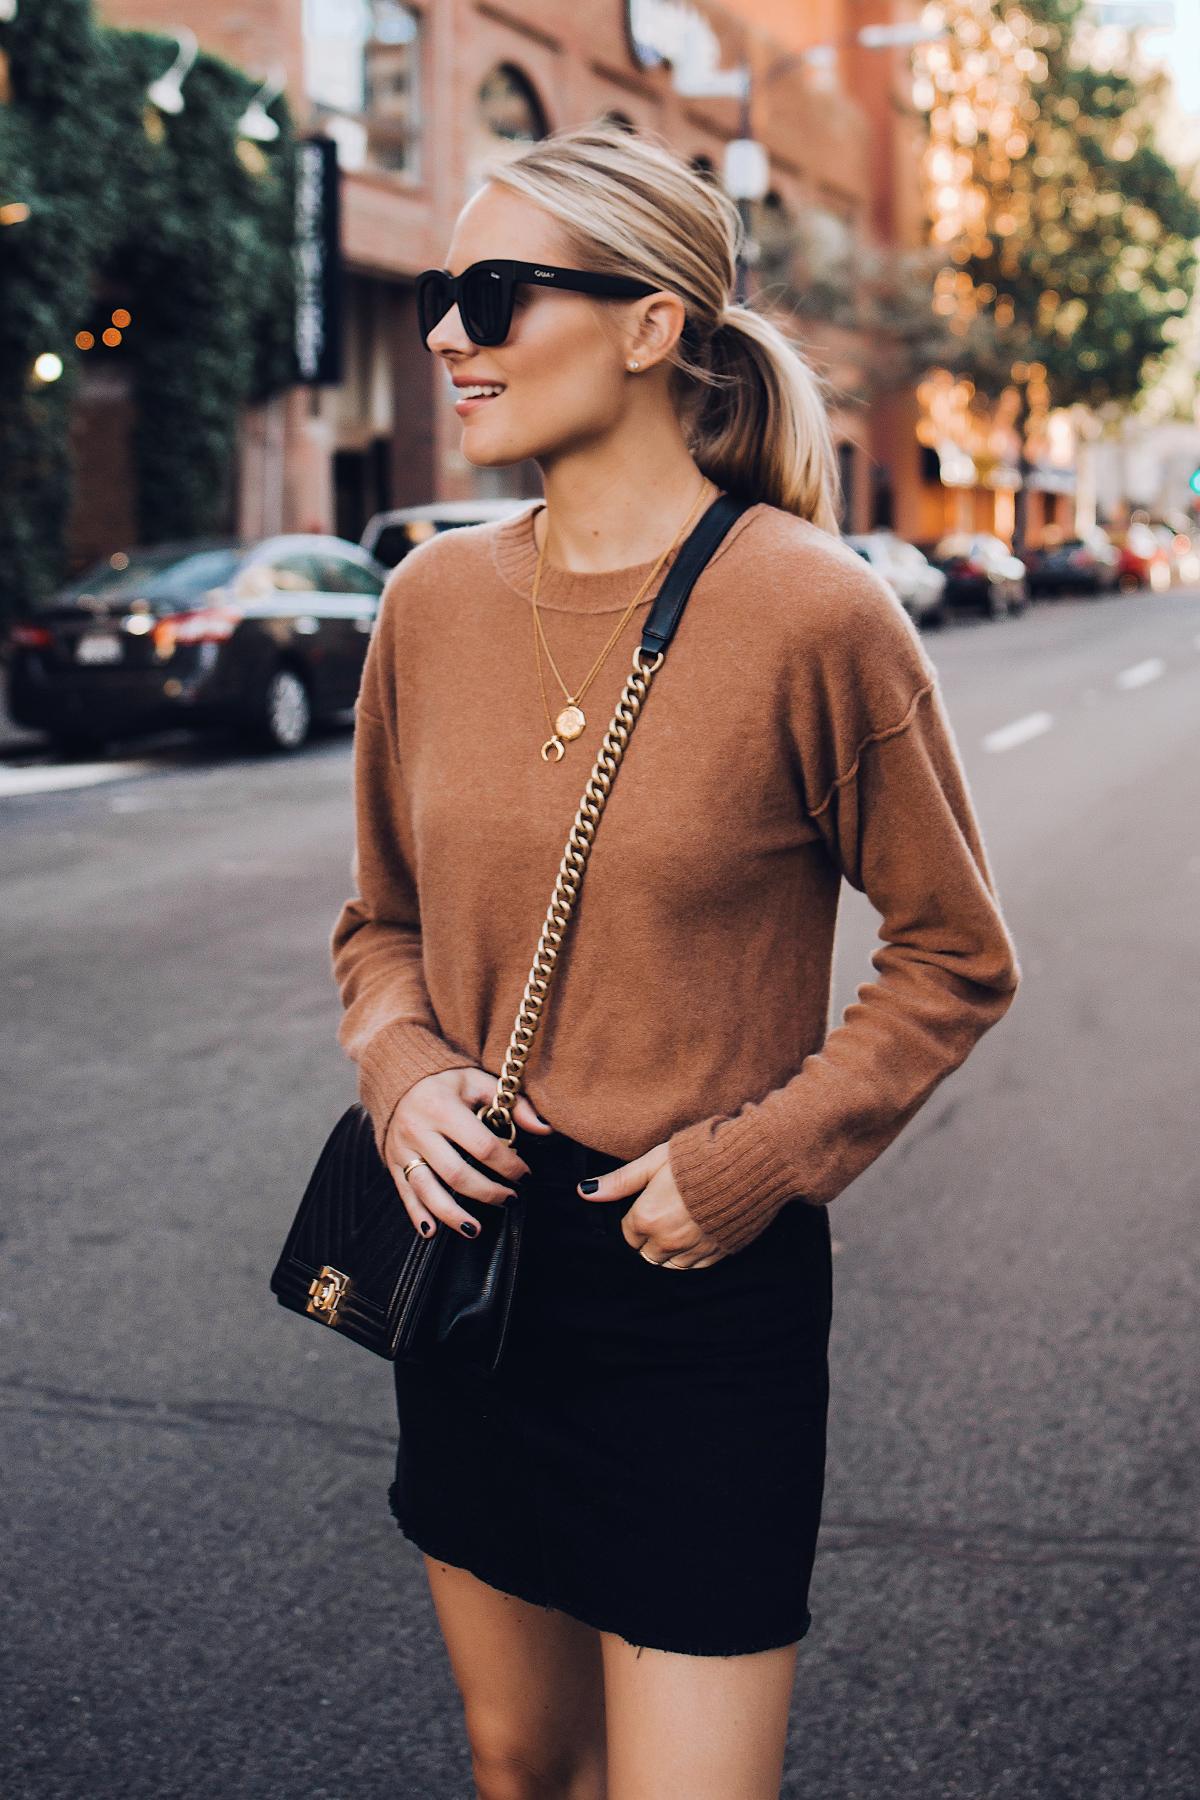 Blonde Woman Wearing Free People Tan Sweater Black Denim Skirt Outfit Chanel Black Boy Bag Fashion Jackson San Diego Fashion Blogger Street Style